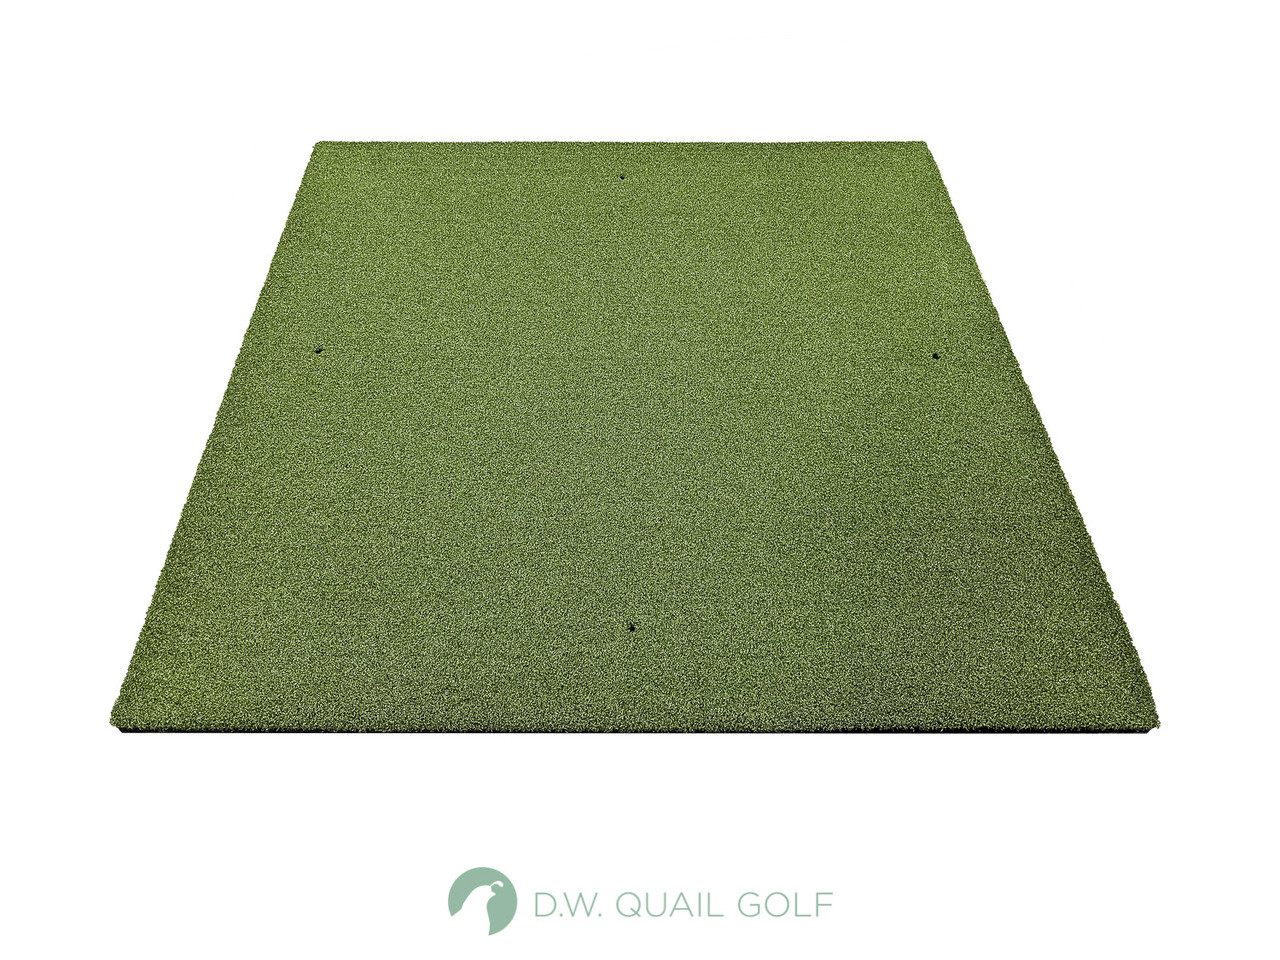 DW Quail Golf